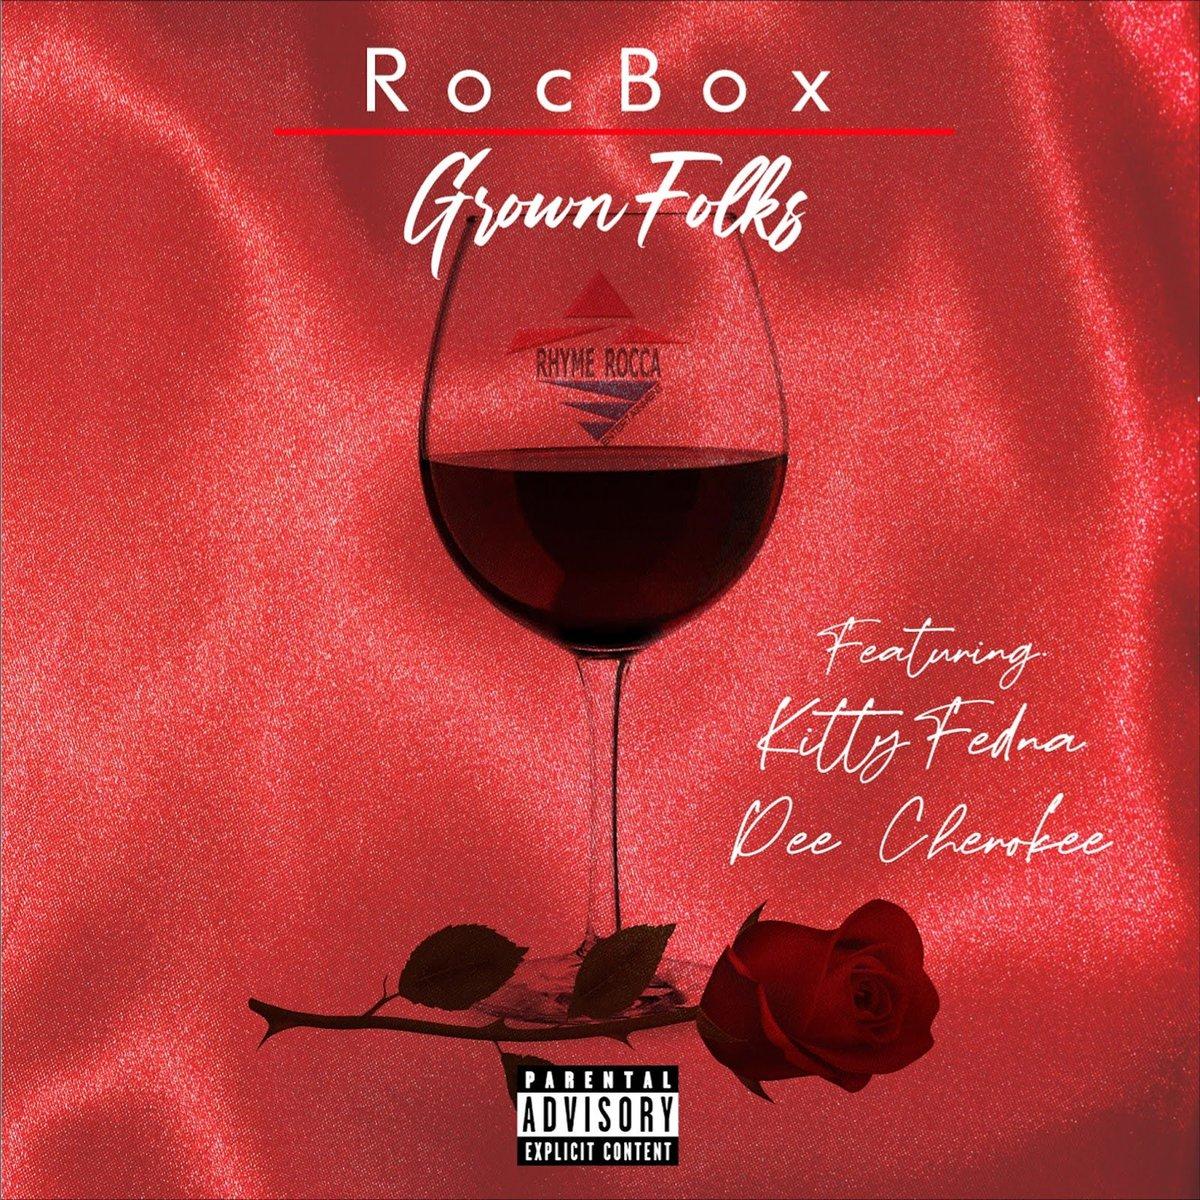 "WGG Digital Entertainment: ""Grown Folks"" single by ROCBOX feat. Kitty Fedha and Dee Cherokee, available now!!: https://t.co/OHHdR6N4du  #Amazon #AppleMusic #GooglePlay #Spotify #Tidal #YouTube #HipHop #Rap #WestCoast #Lynwood #RhymeRocca #WGG #ROCBOX #KittyFedha #DeeCherokee https://t.co/IddVulJ4WI"